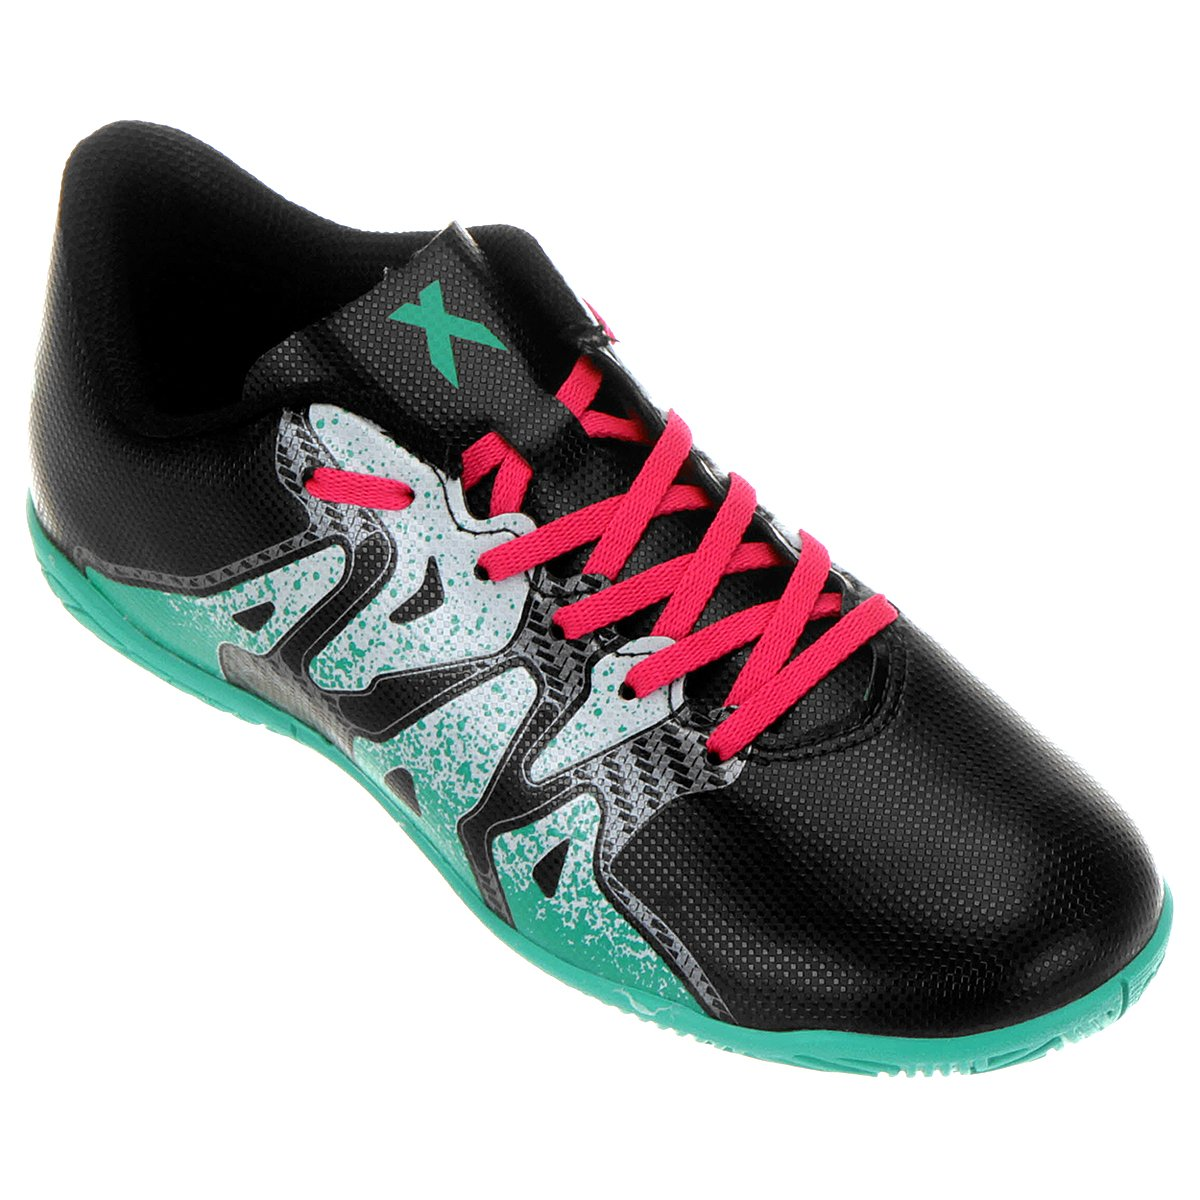 7da3377c0a652 Chuteira Futsal Juvenil Adidas X 15 4 IN | Allianz Parque Shop